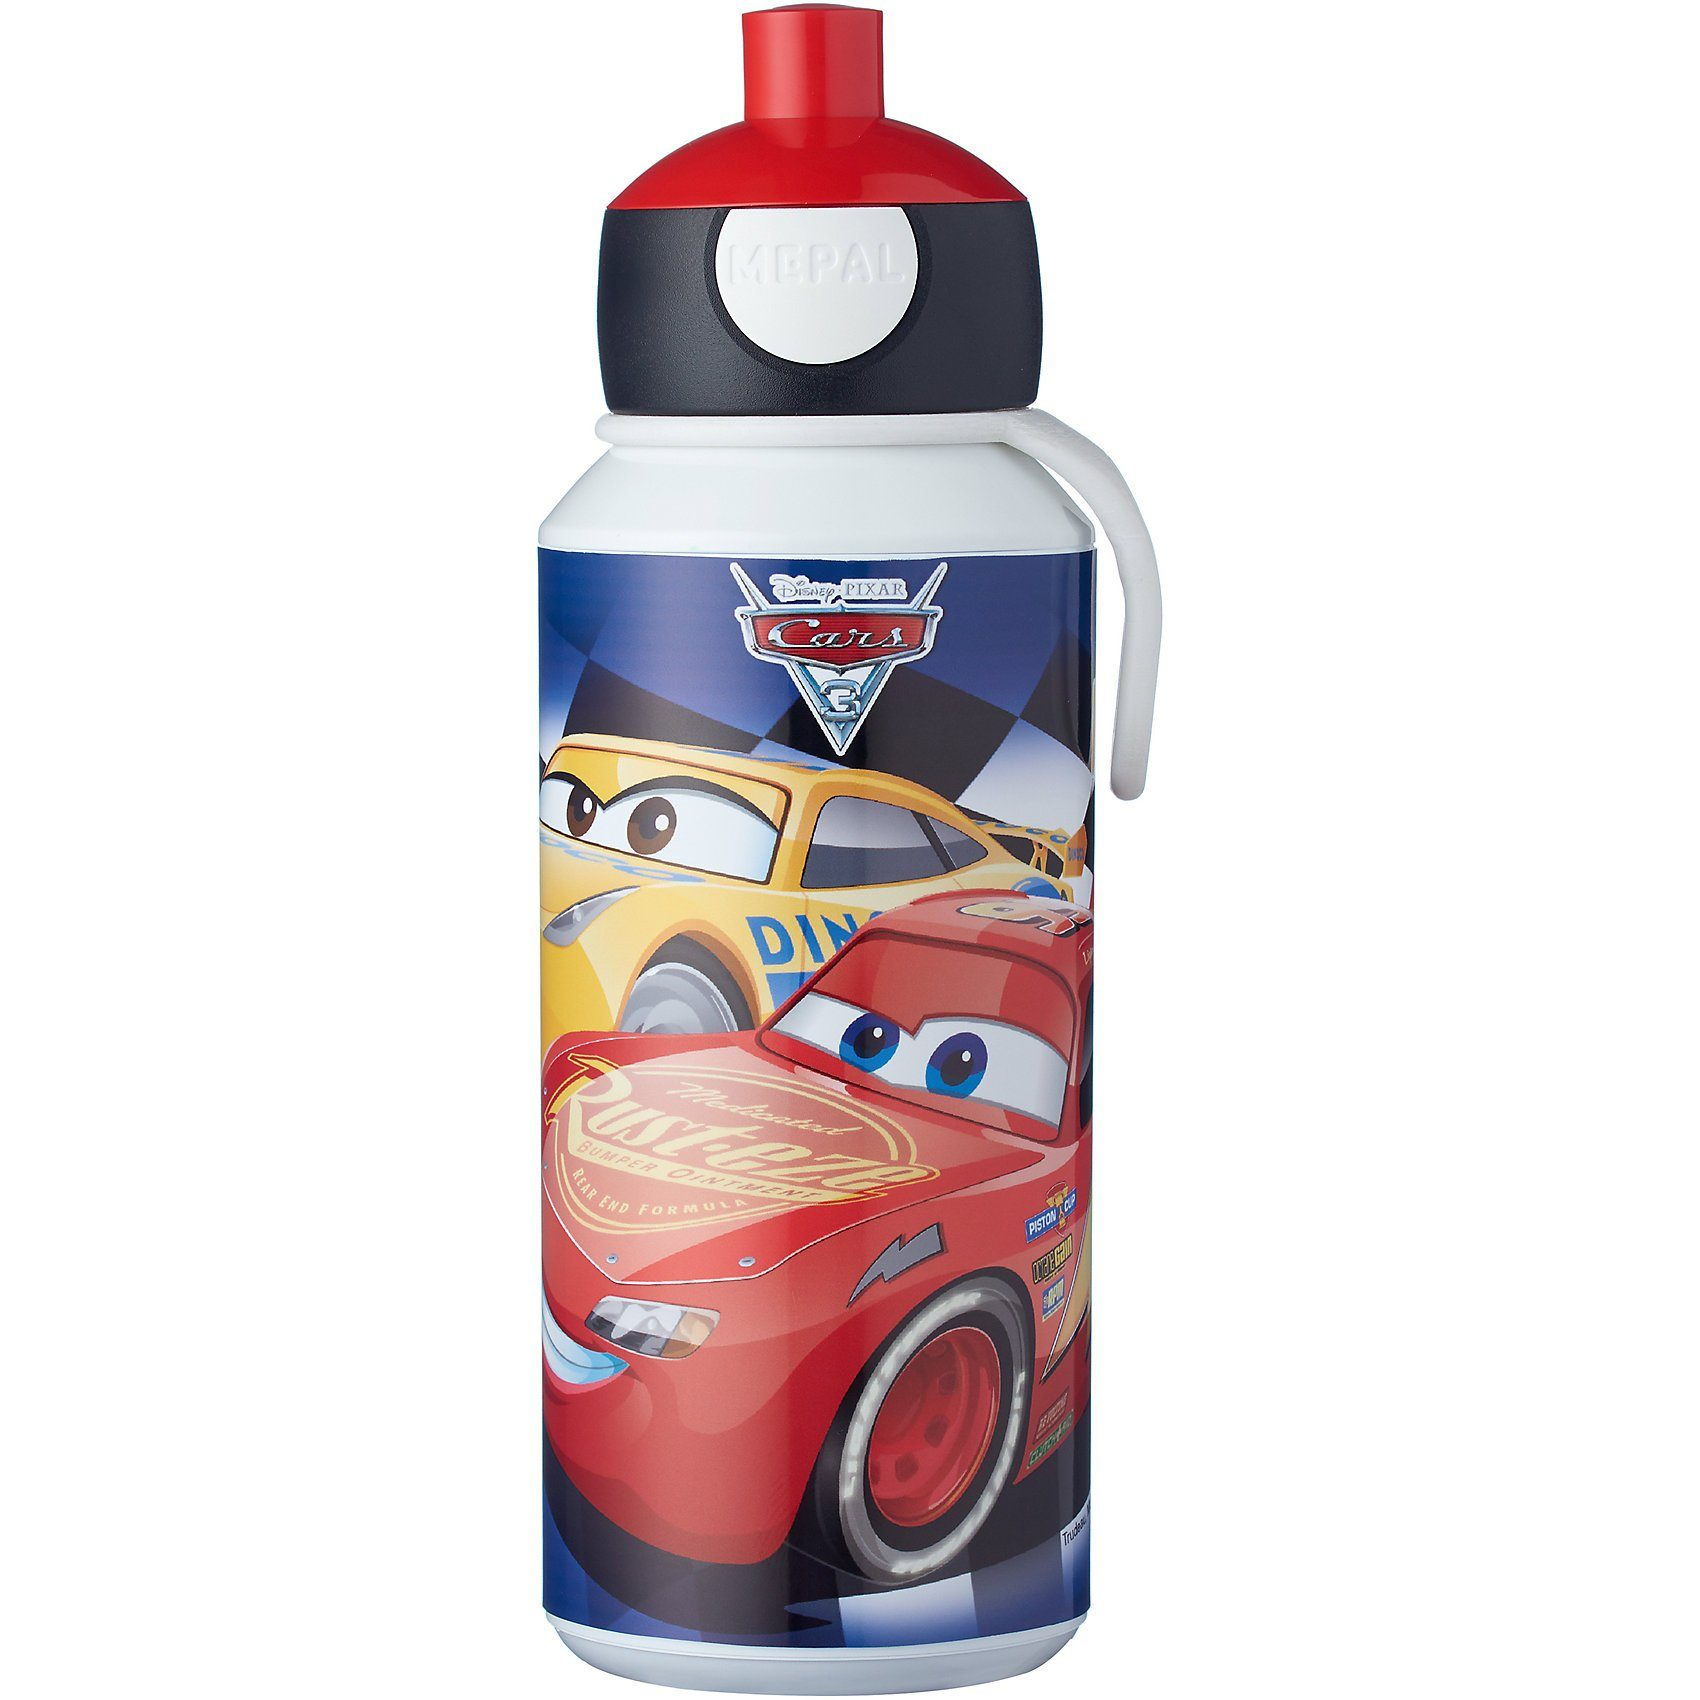 Rosti Mepal Trinkflasche pop-up campus Cars, 400 ml